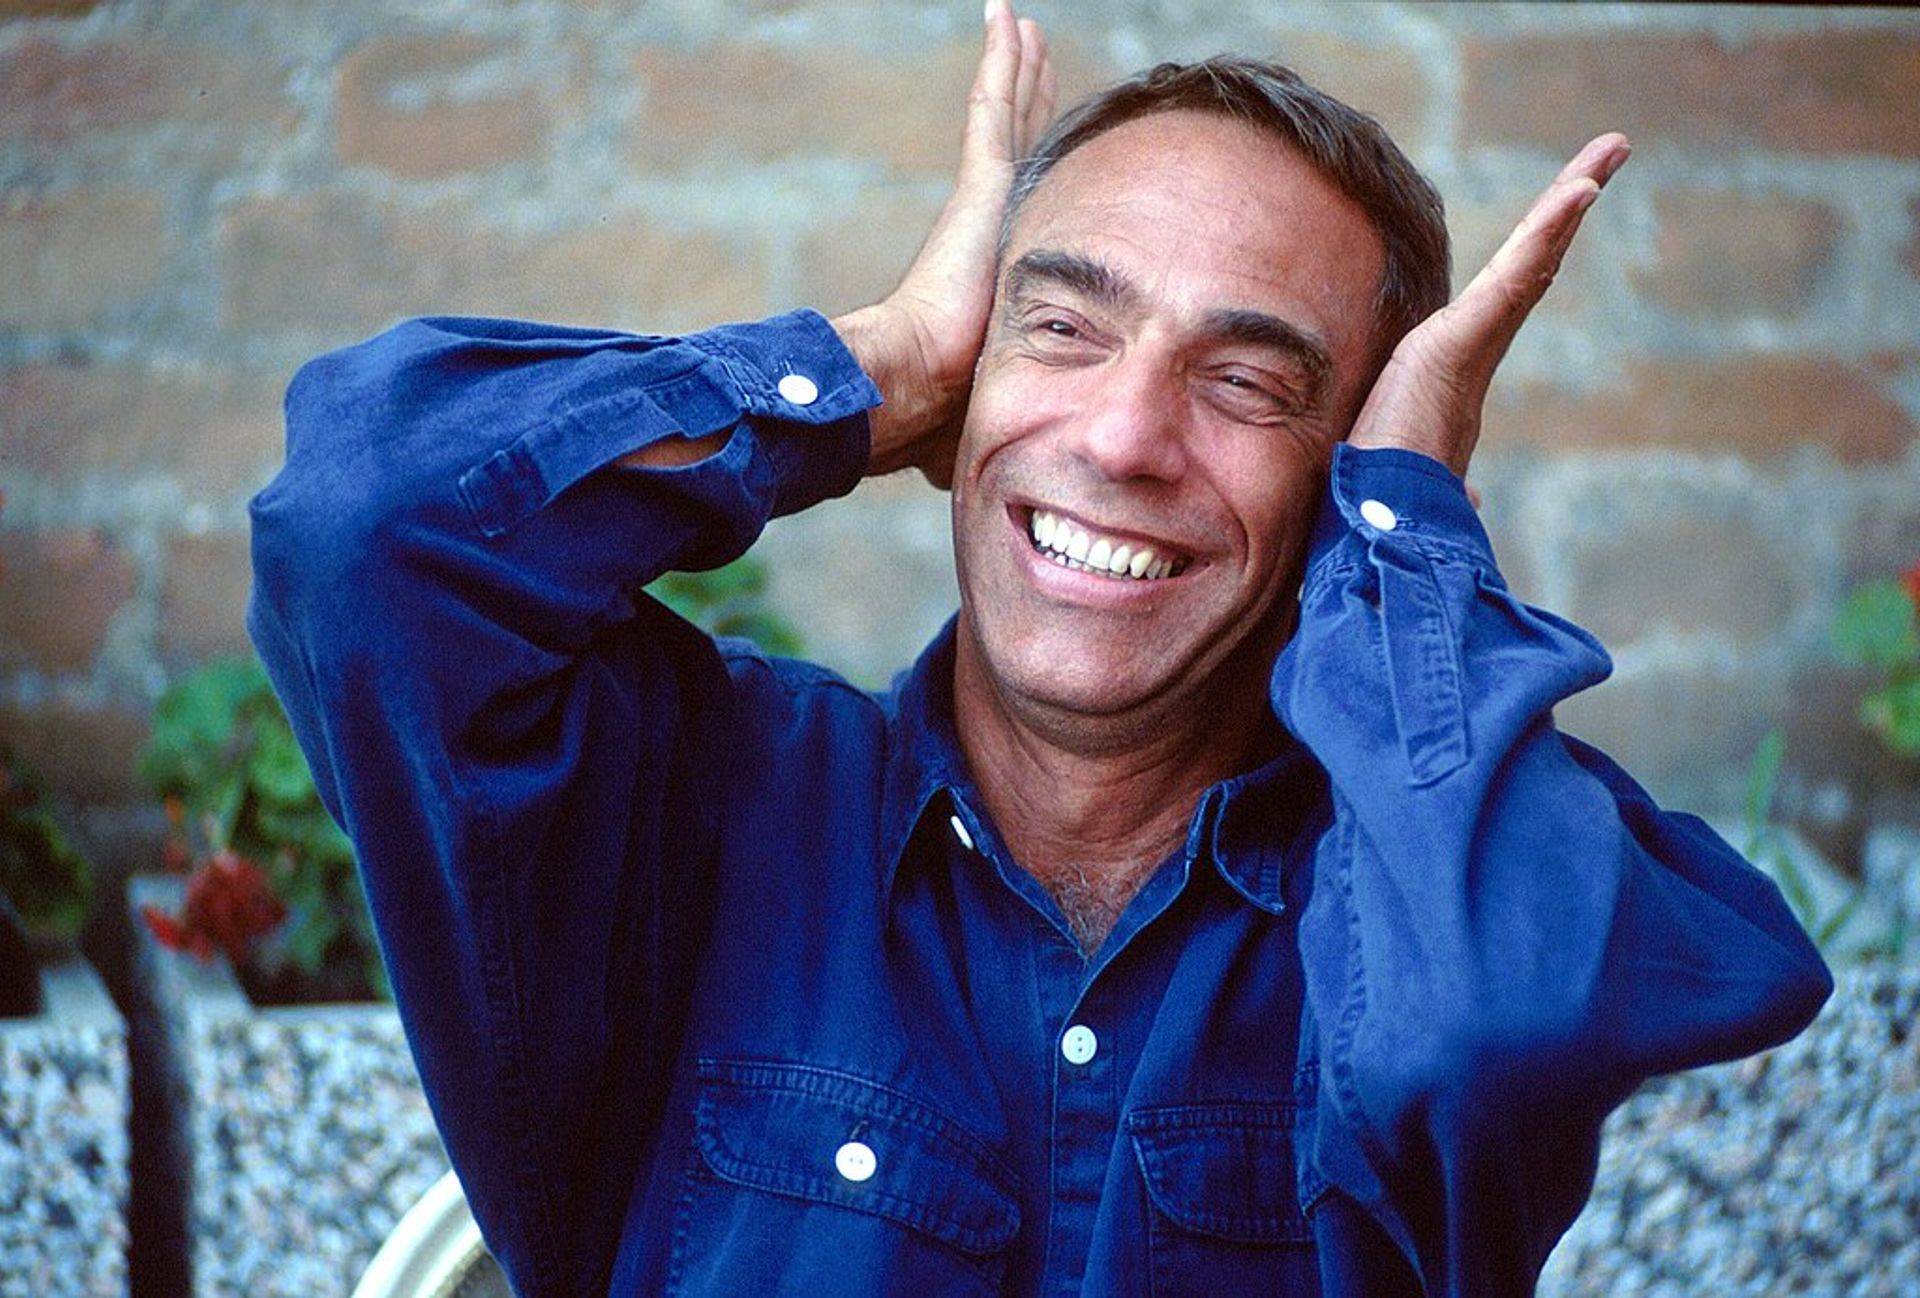 Derek Jarman at the 1991 Venice Film Festival. Gorup de Besanez via Wikimedia Commons